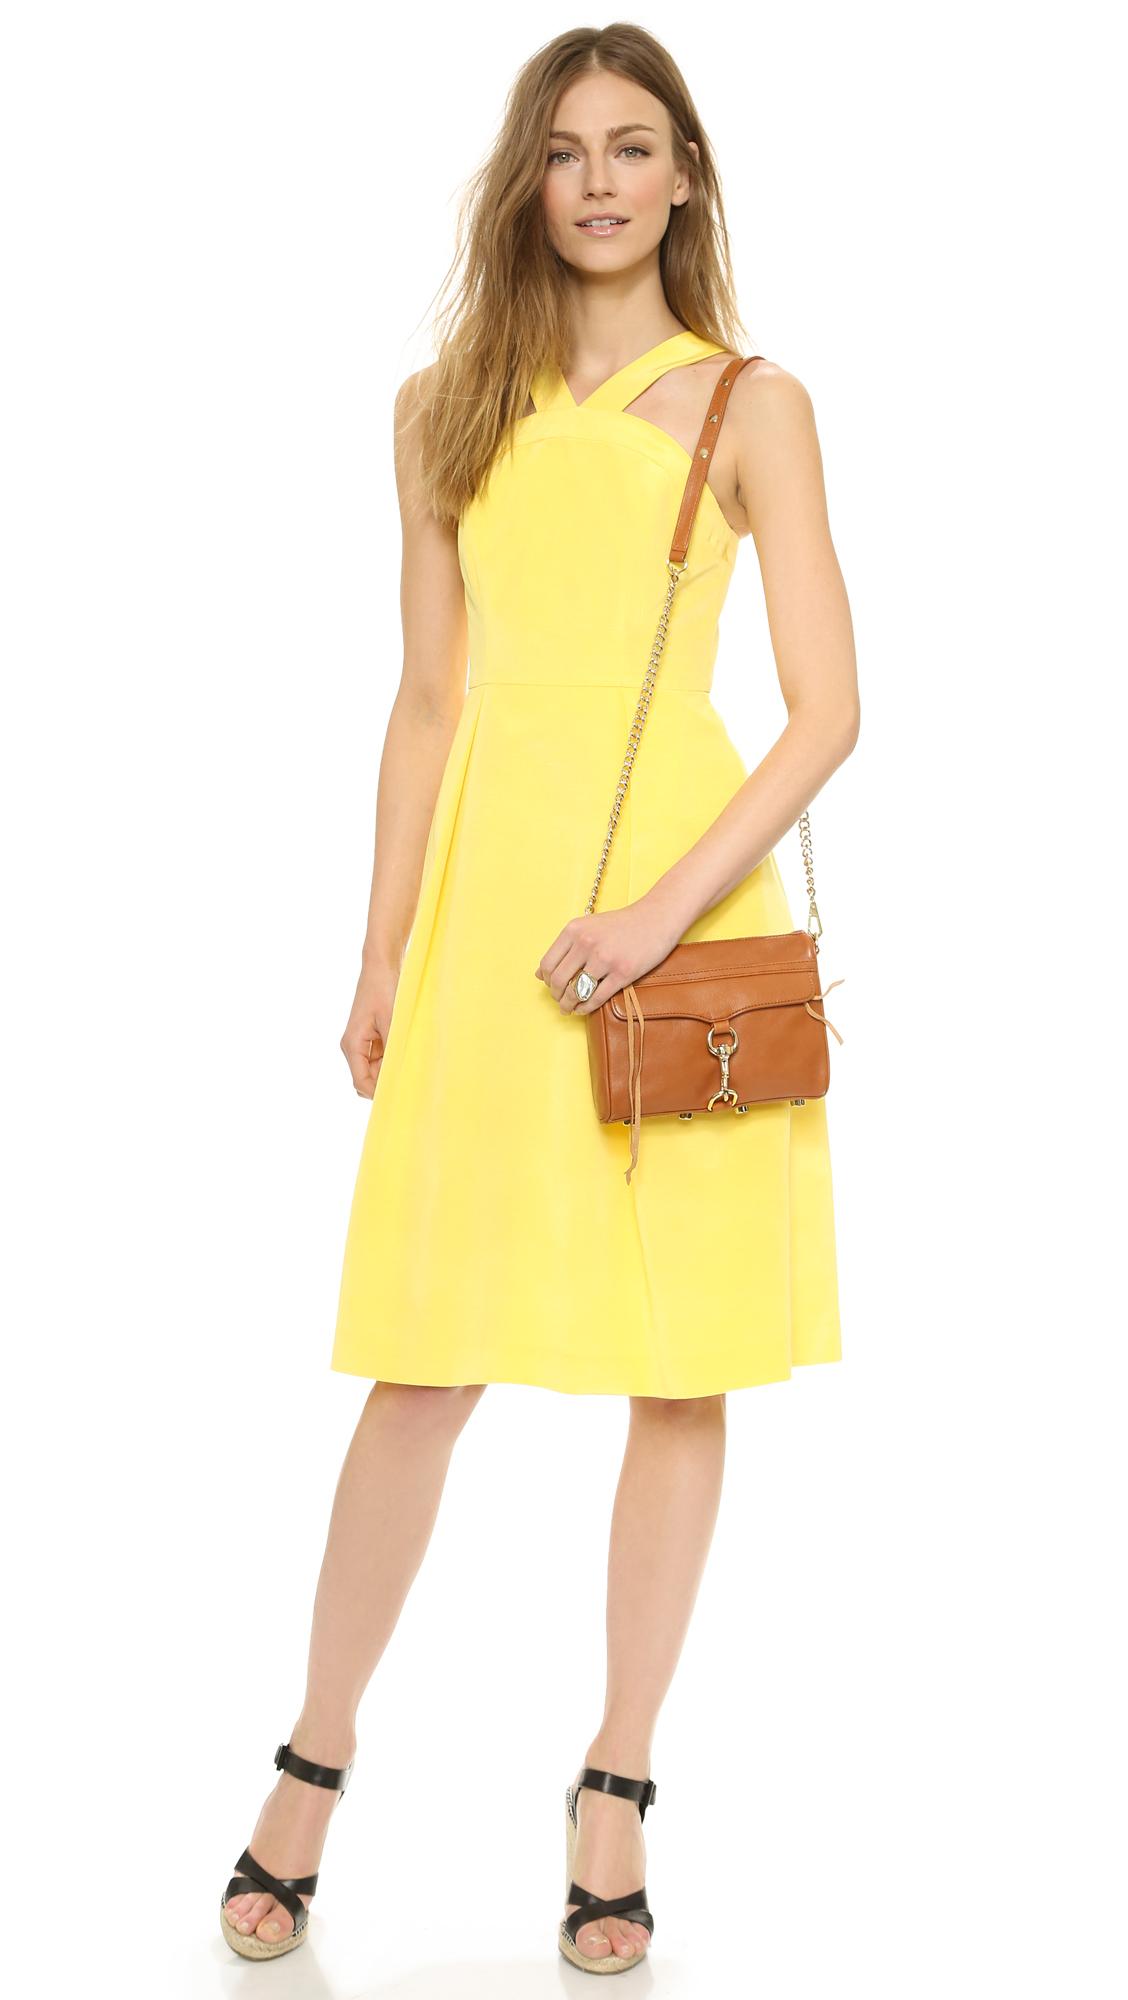 Rebecca minkoff Mini Mac Bag in Brown (Almond) | Lyst